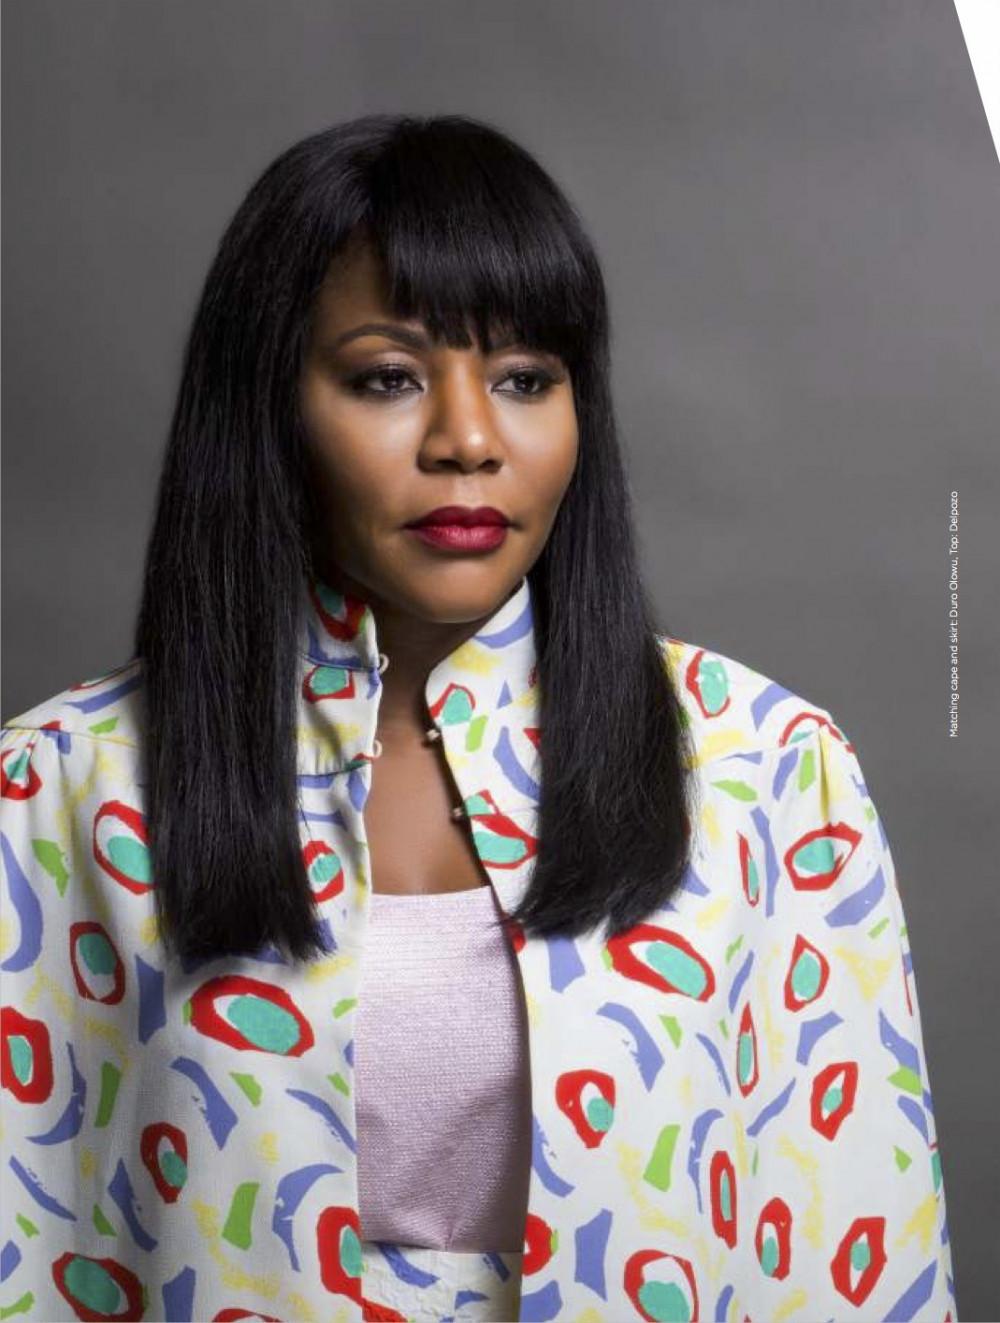 Leading African Female Entrepreneurs Reni Folawiyo, Folake Coker, Tara  Fela-Durotoye, Deola Sagoe & More discuss Female Empowerment in SCHICK  Magazine | BellaNaija